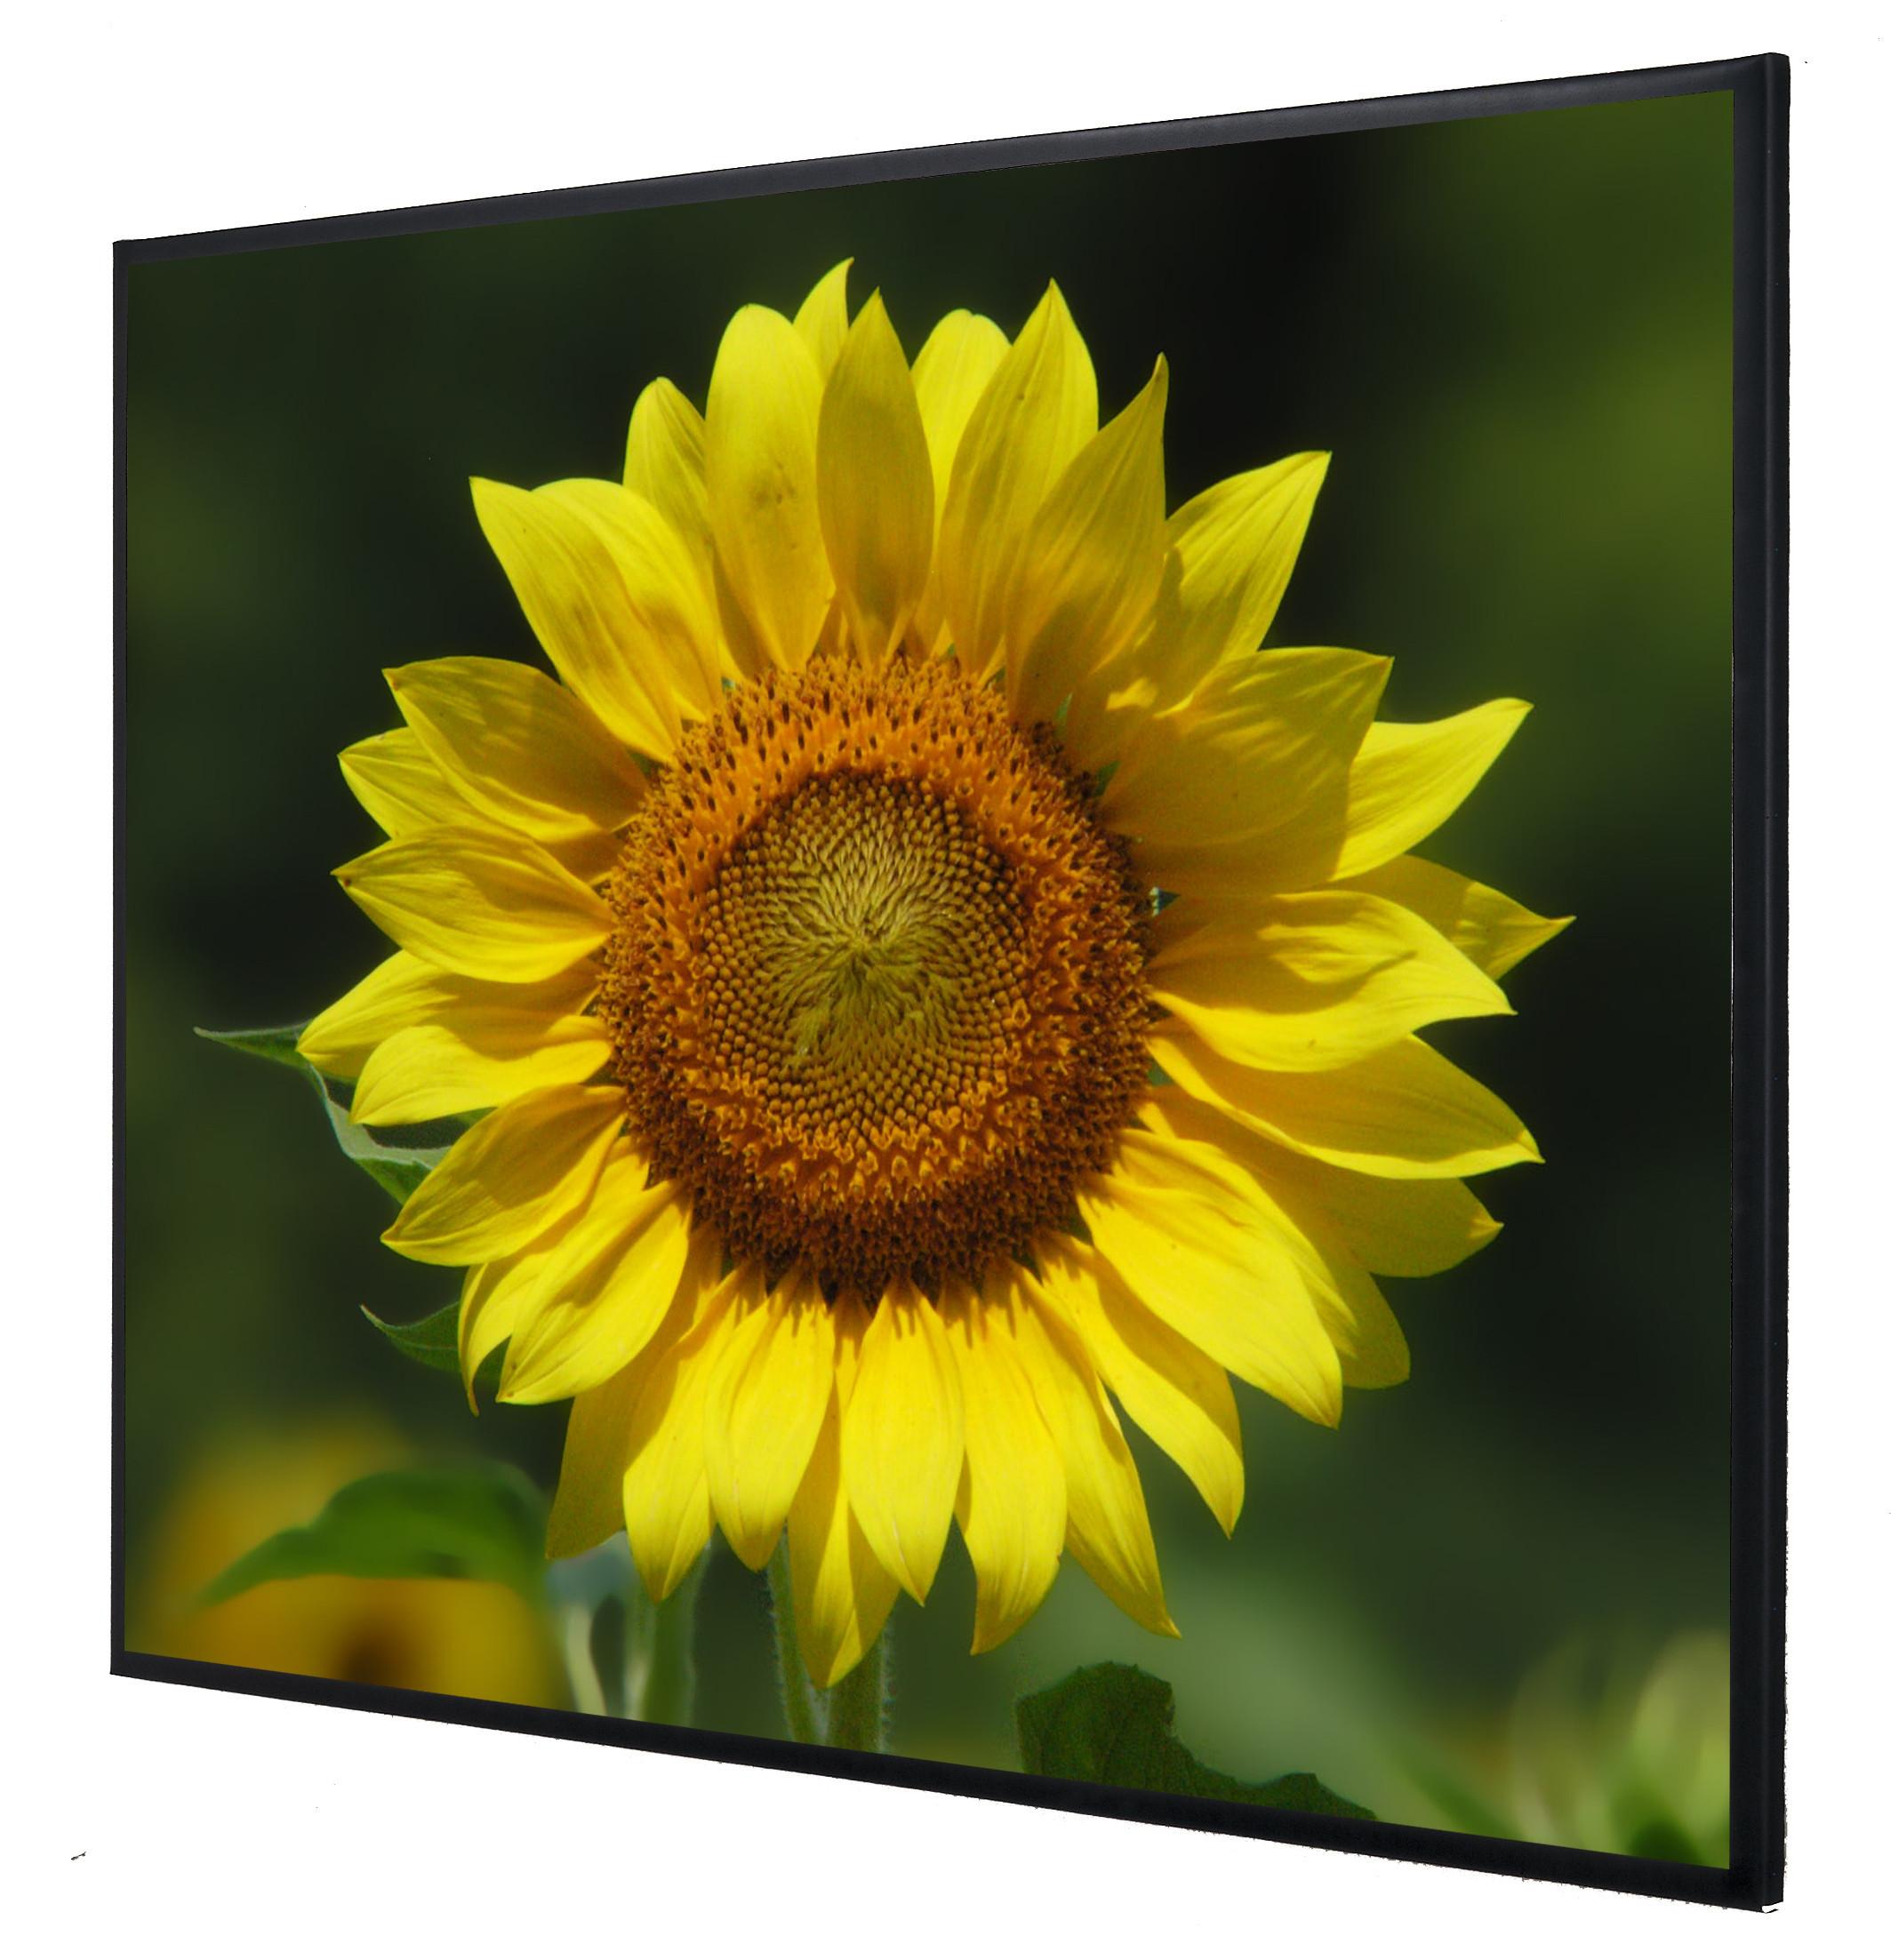 Vision Light 190 x 142,5 cm video format med Veltex og ReAct filmdug